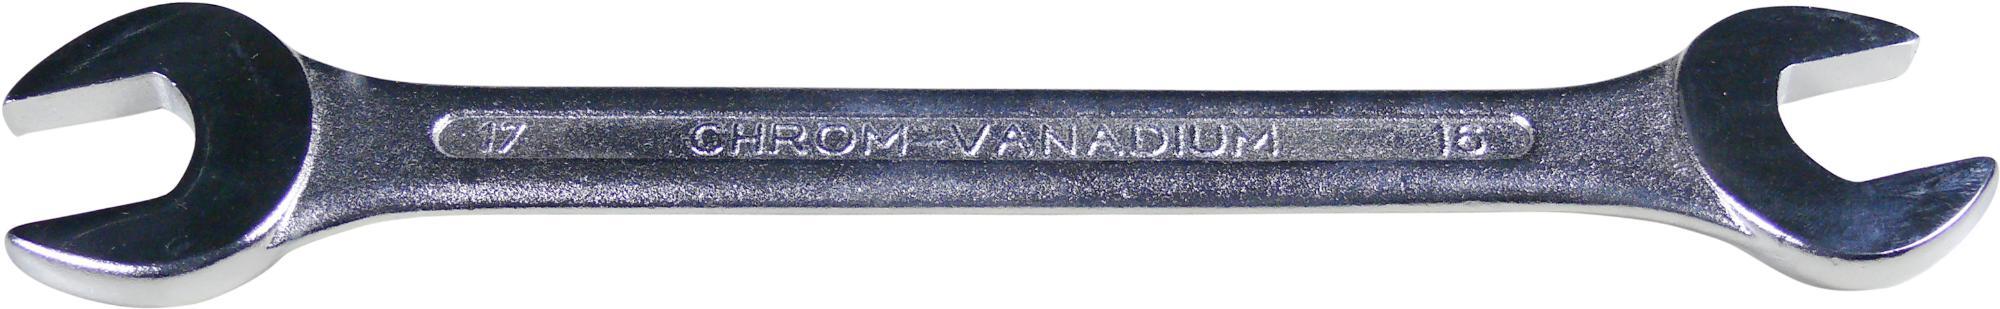 Kľúč vidlica-vidlica, 18x19 mm